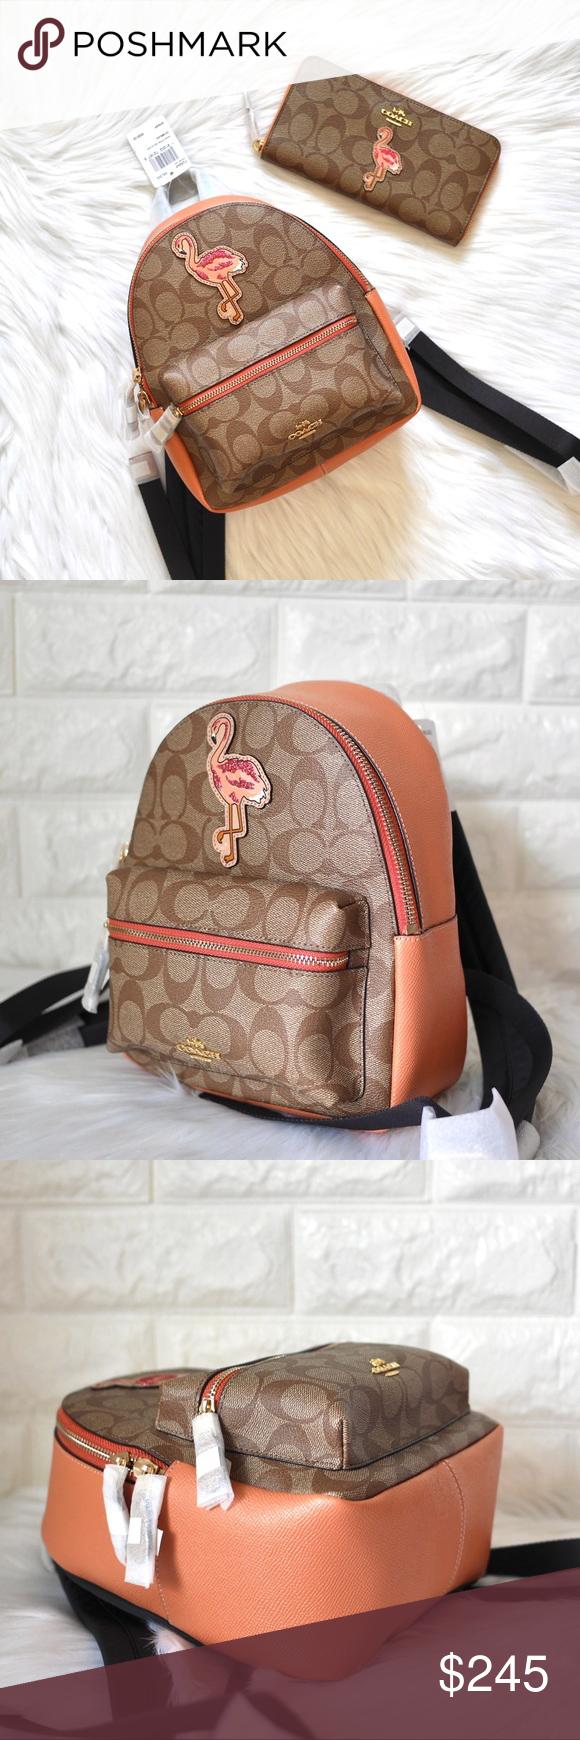 d41553dc7c4c 💖NWT Coach Mini Charlie Flamingo Backpack 🌺🌴HAWAII FLAMINGO EDITION  🌿BRAND NEW WITH